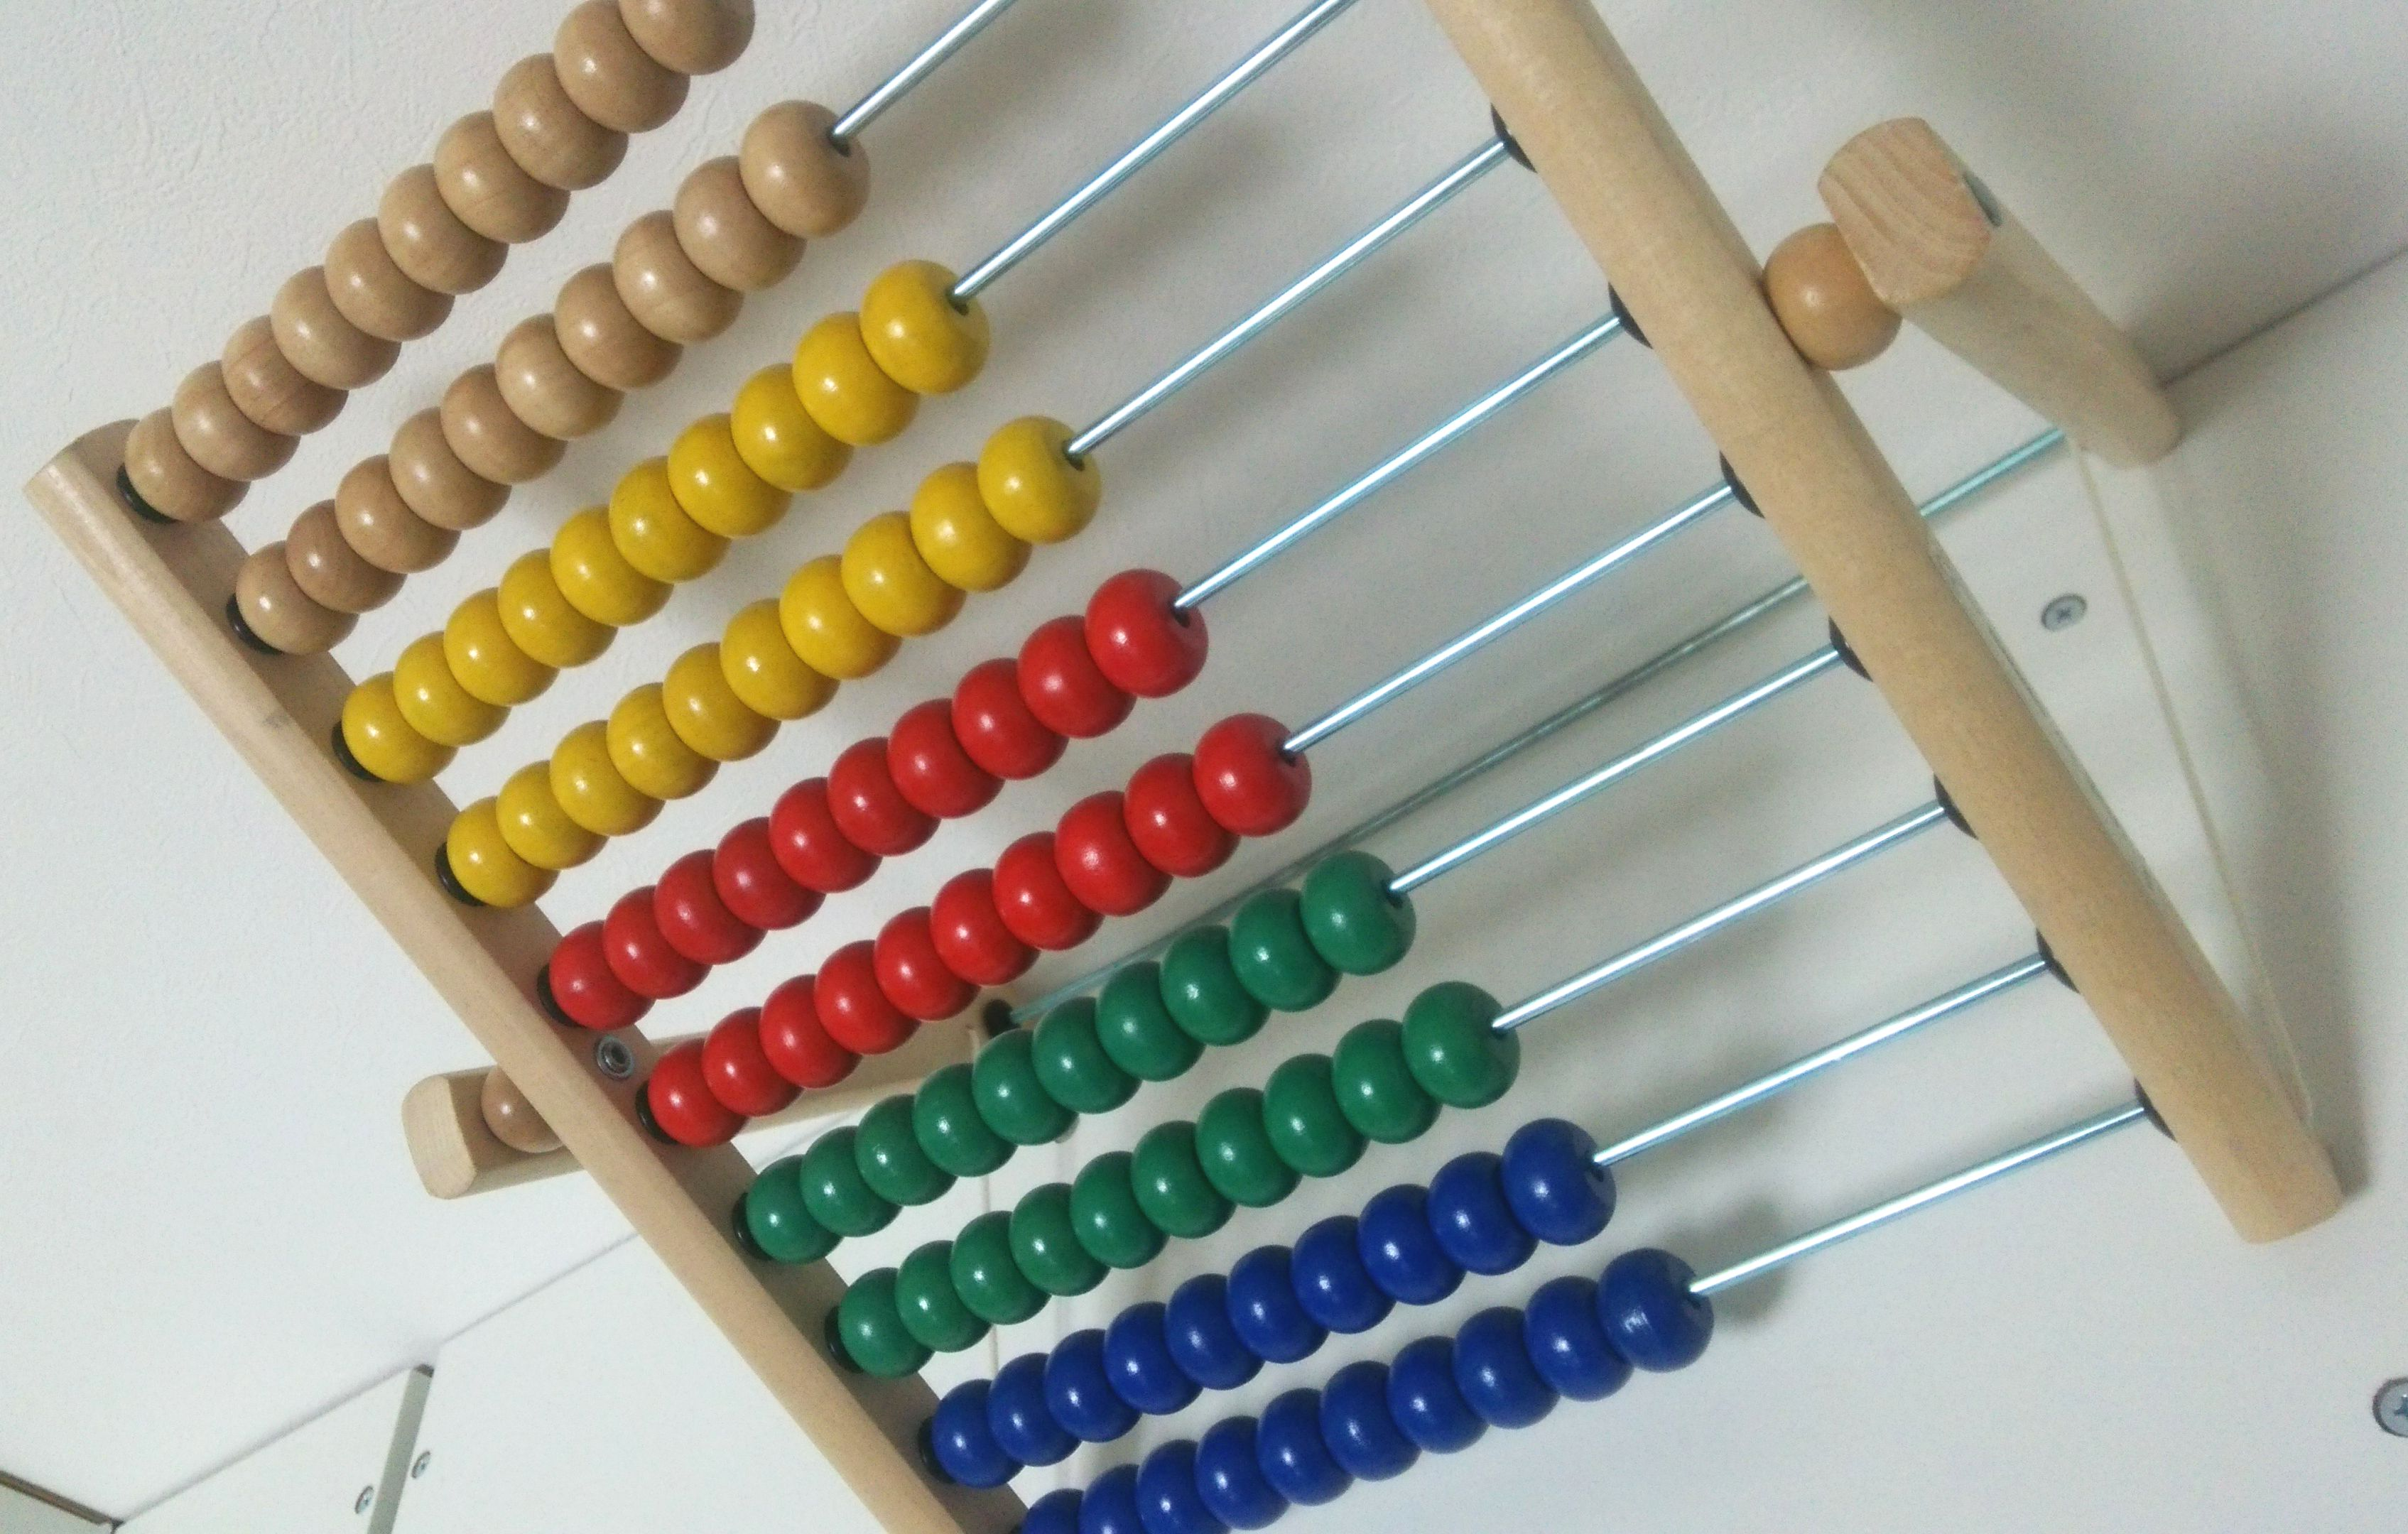 IKEA(イケア)のおもちゃで知育~教室でも使っているおすすめ知育玩具